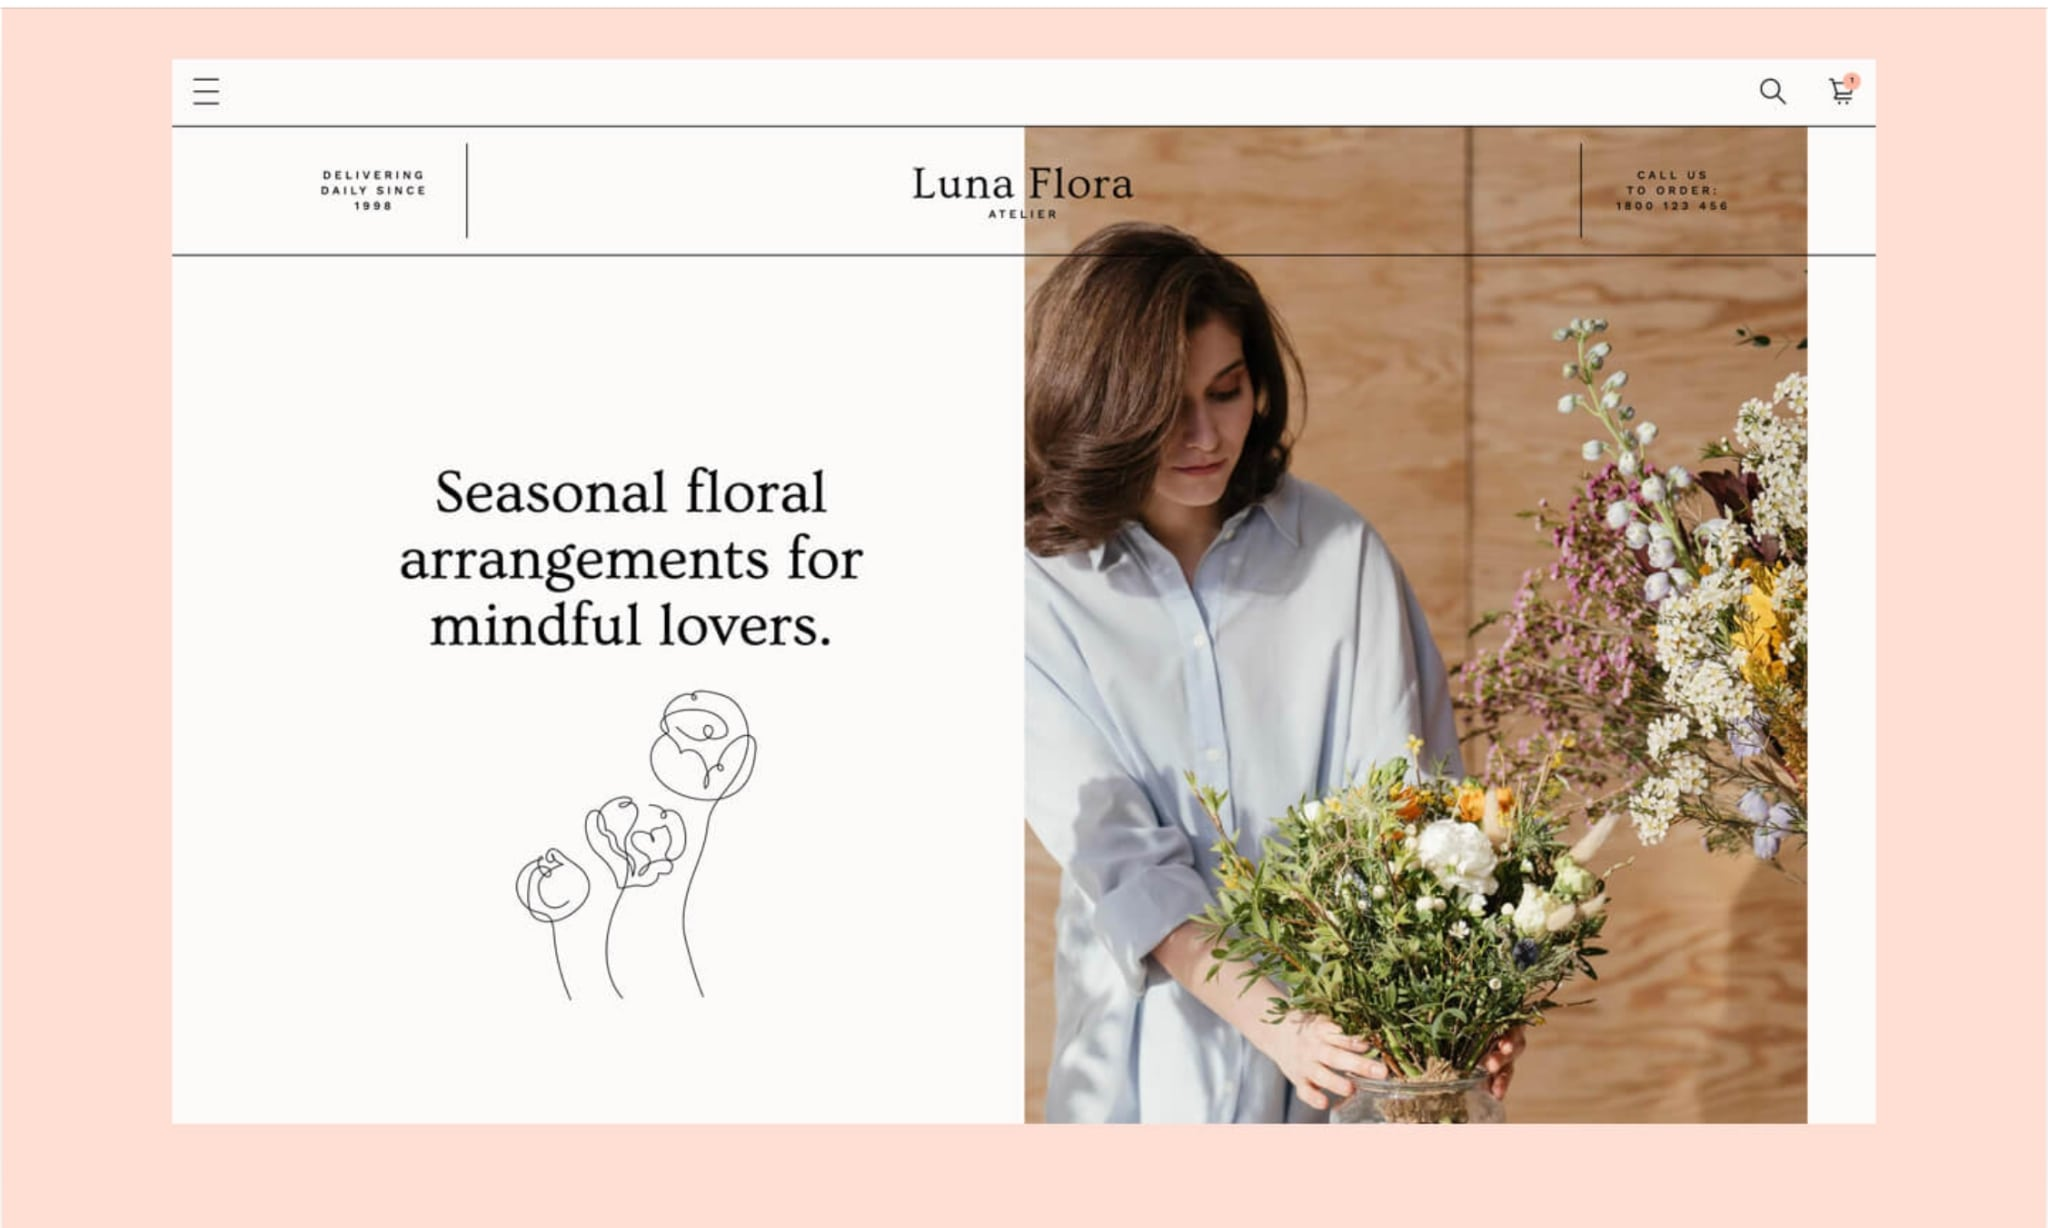 An image of the Luna Flora website.